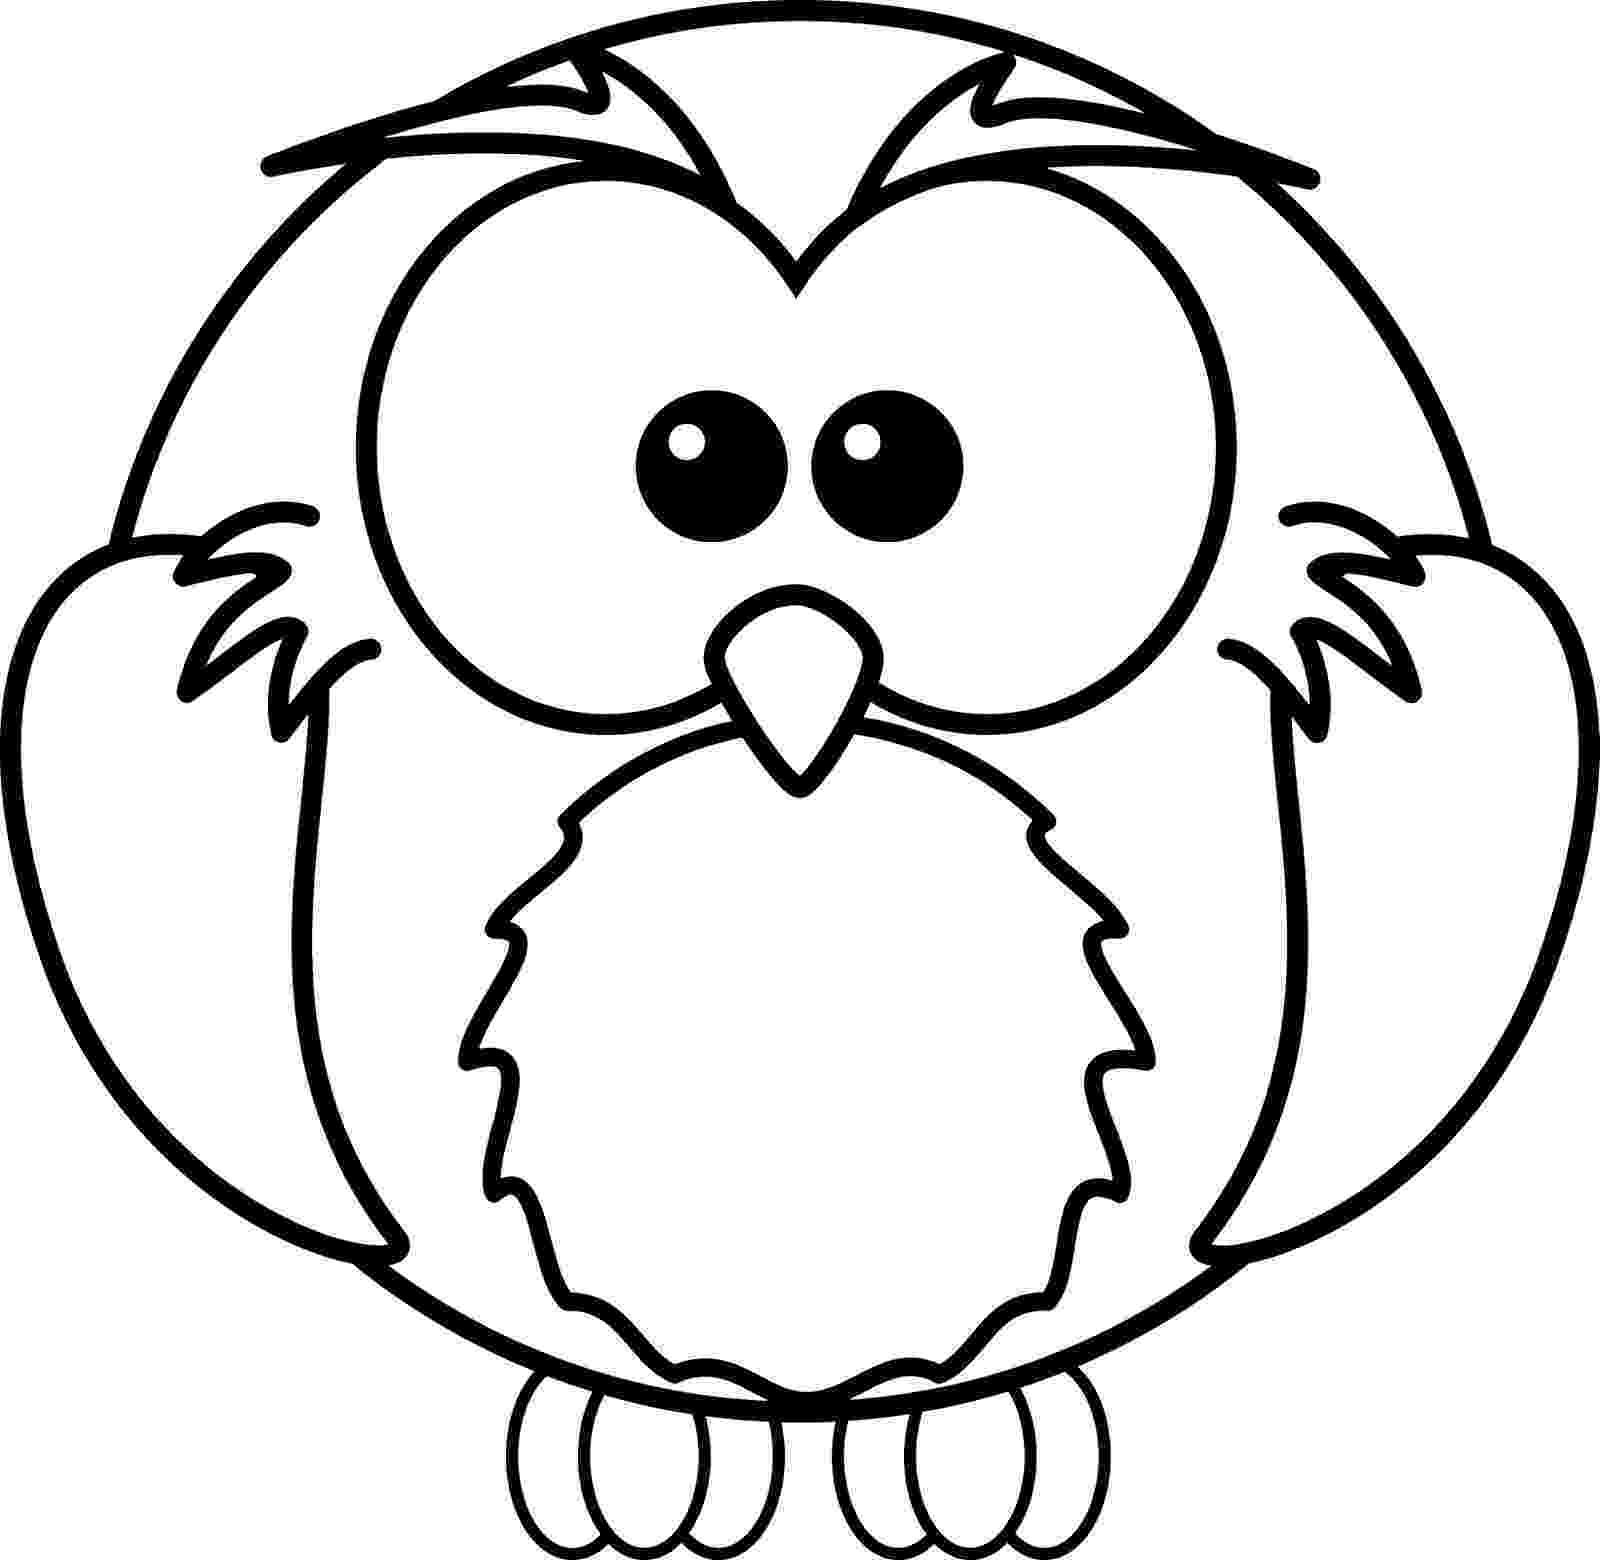 printable owl colouring baby owls coloring sheet to print colouring printable owl